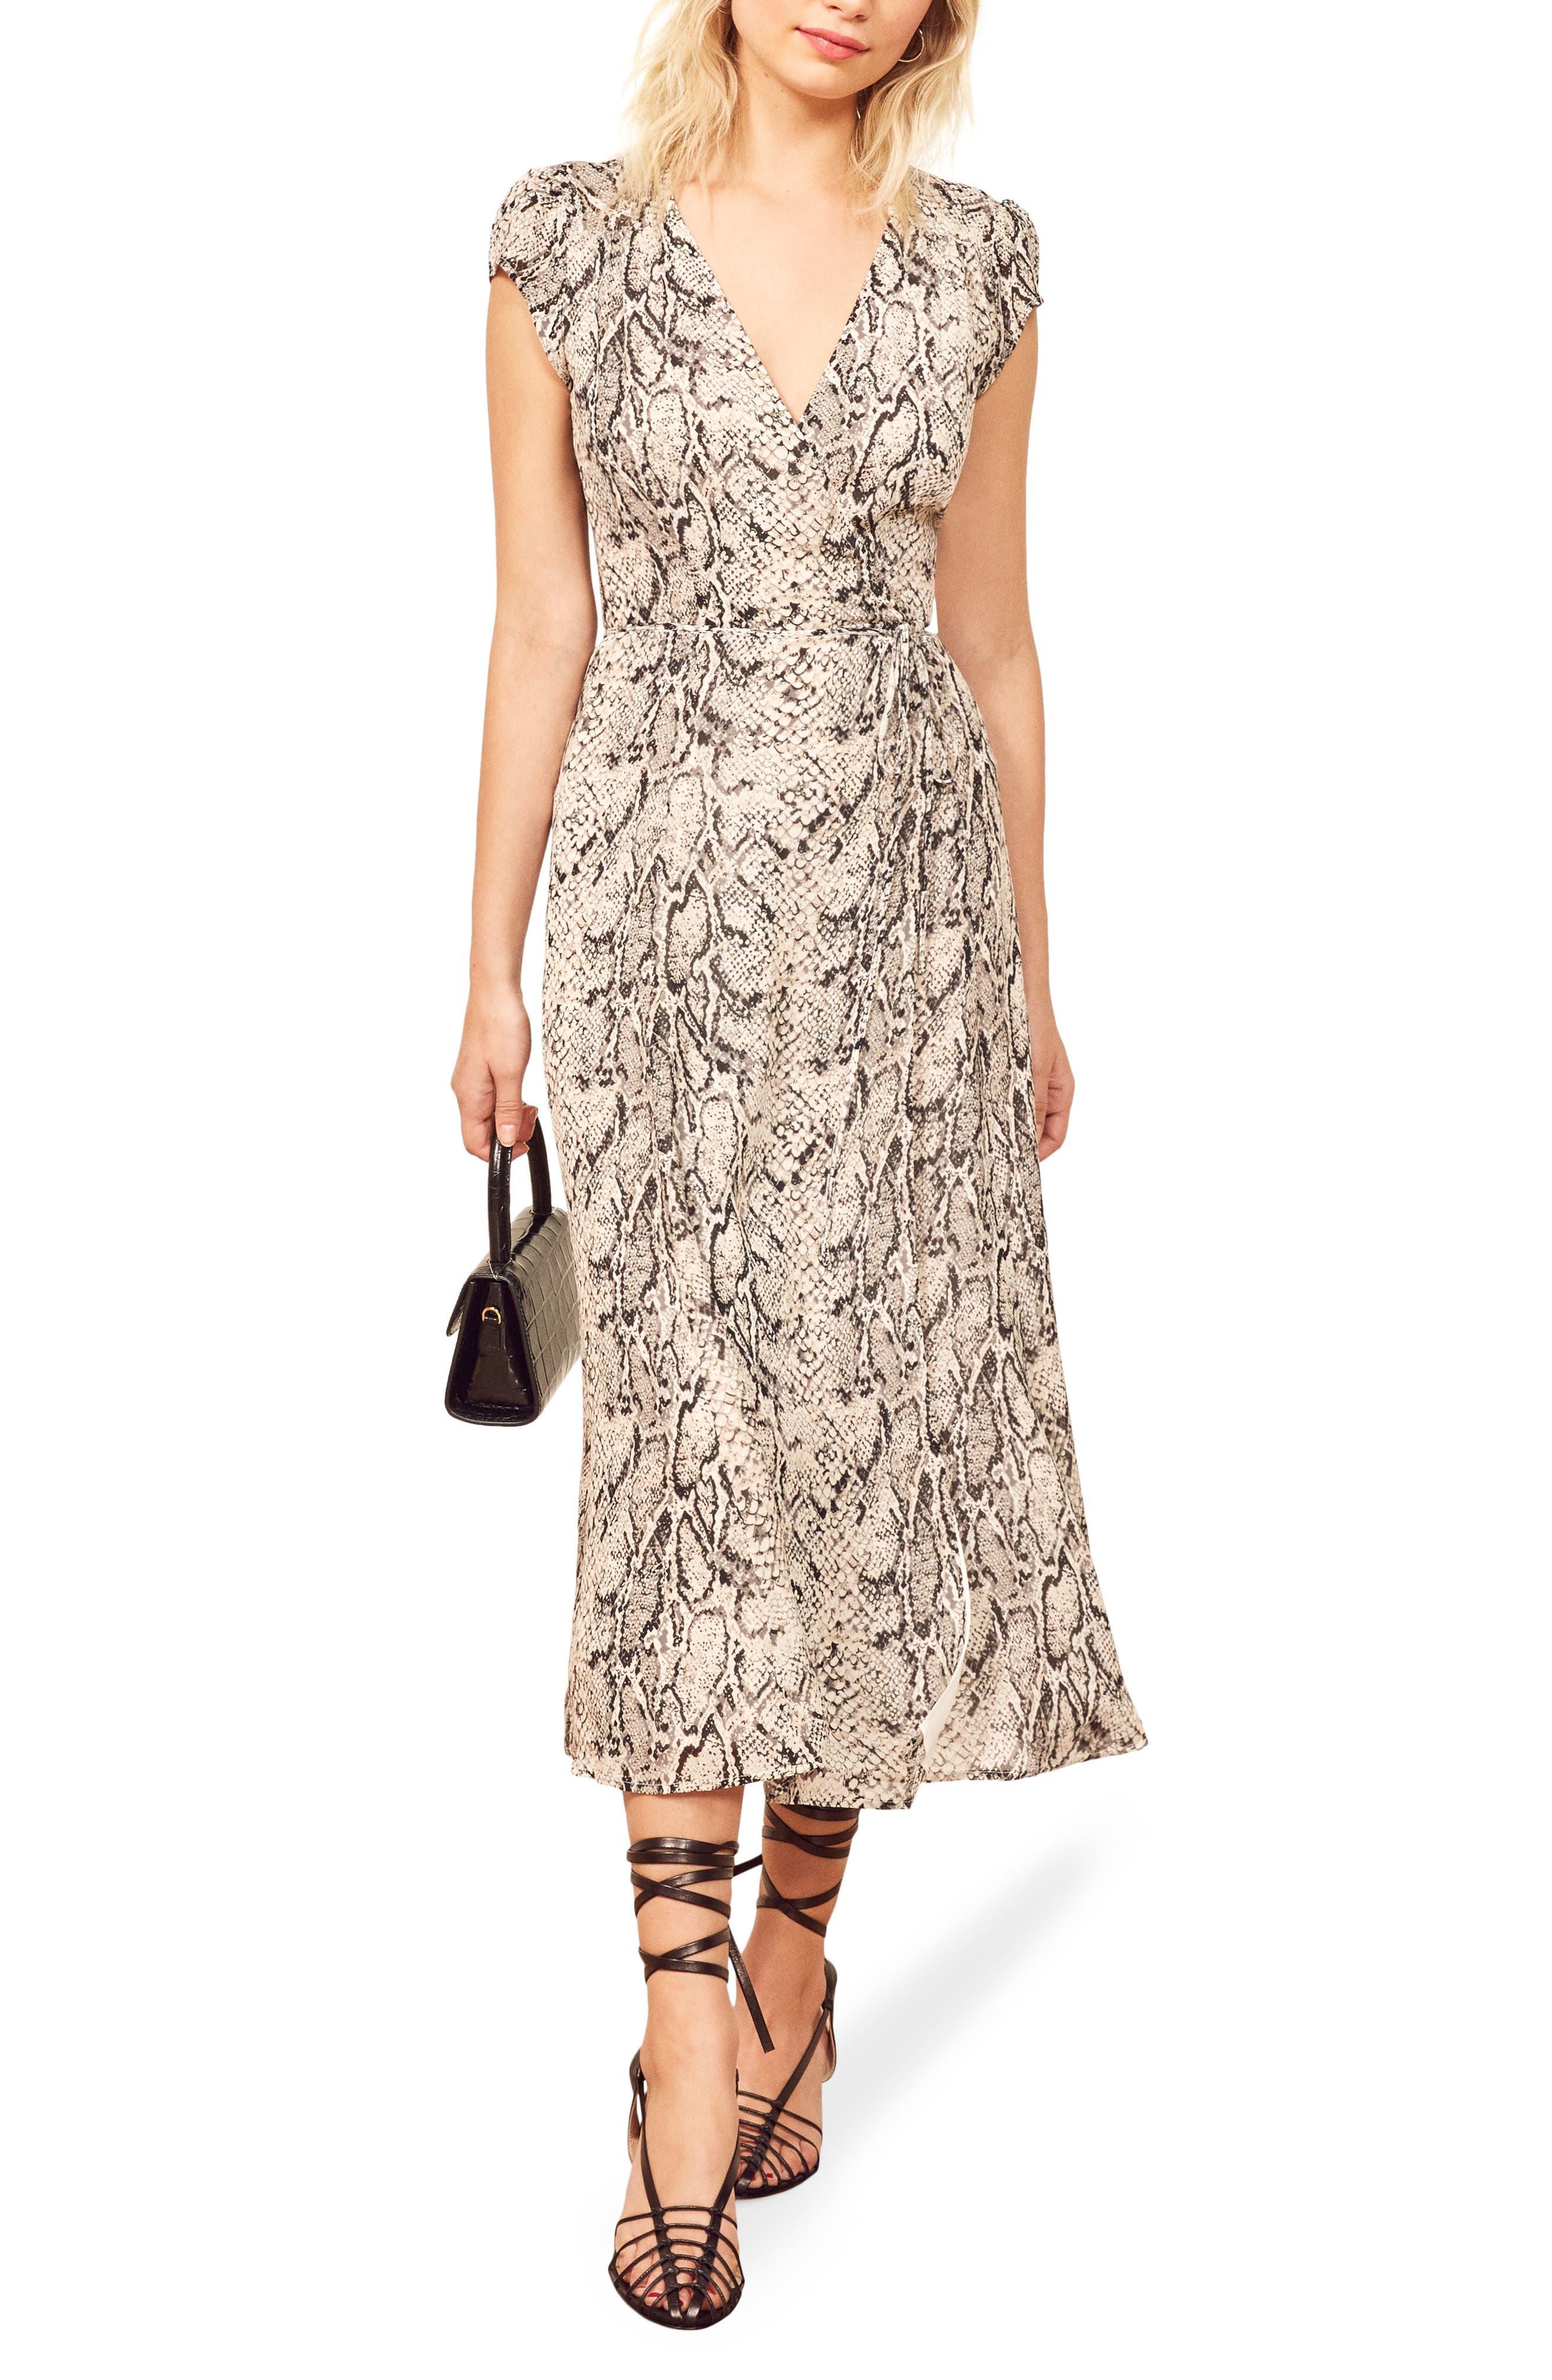 REFORMATION, Carina Midi Wrap Dress, Main thumbnail 1, color, RATTLESNAKE